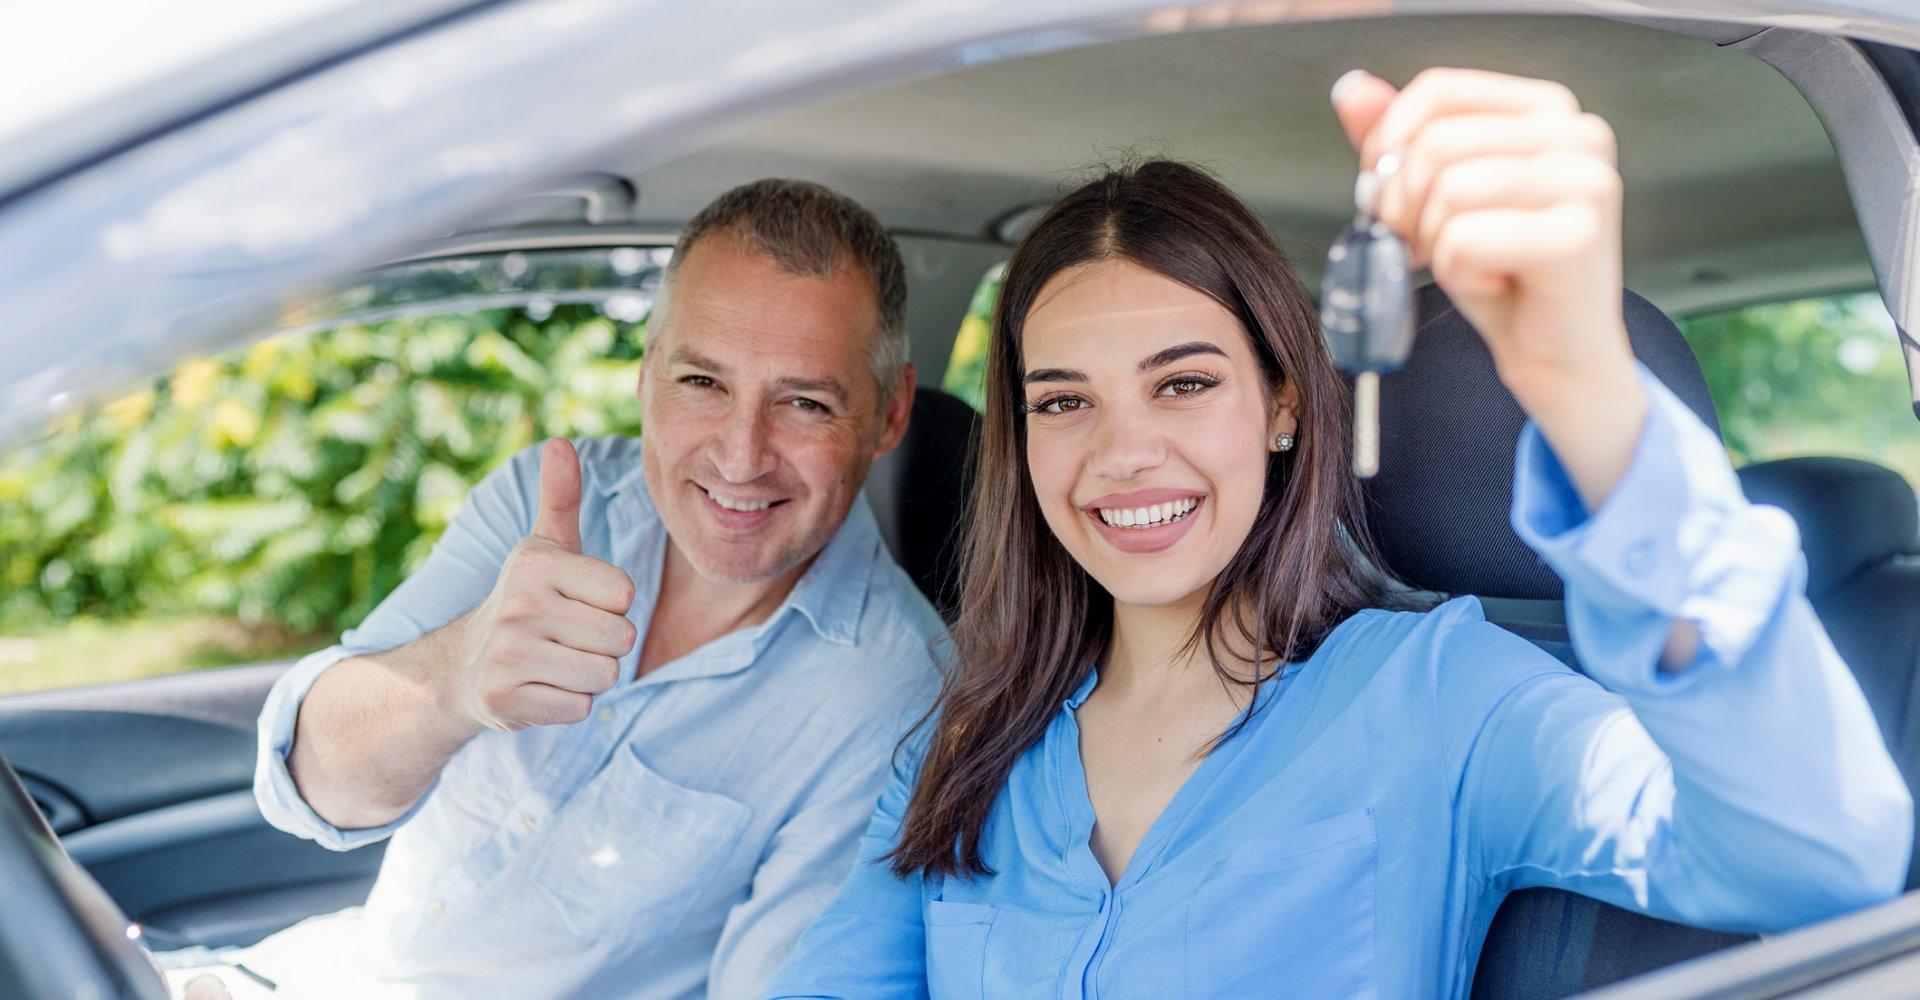 Driving Instructor Student Car Keys